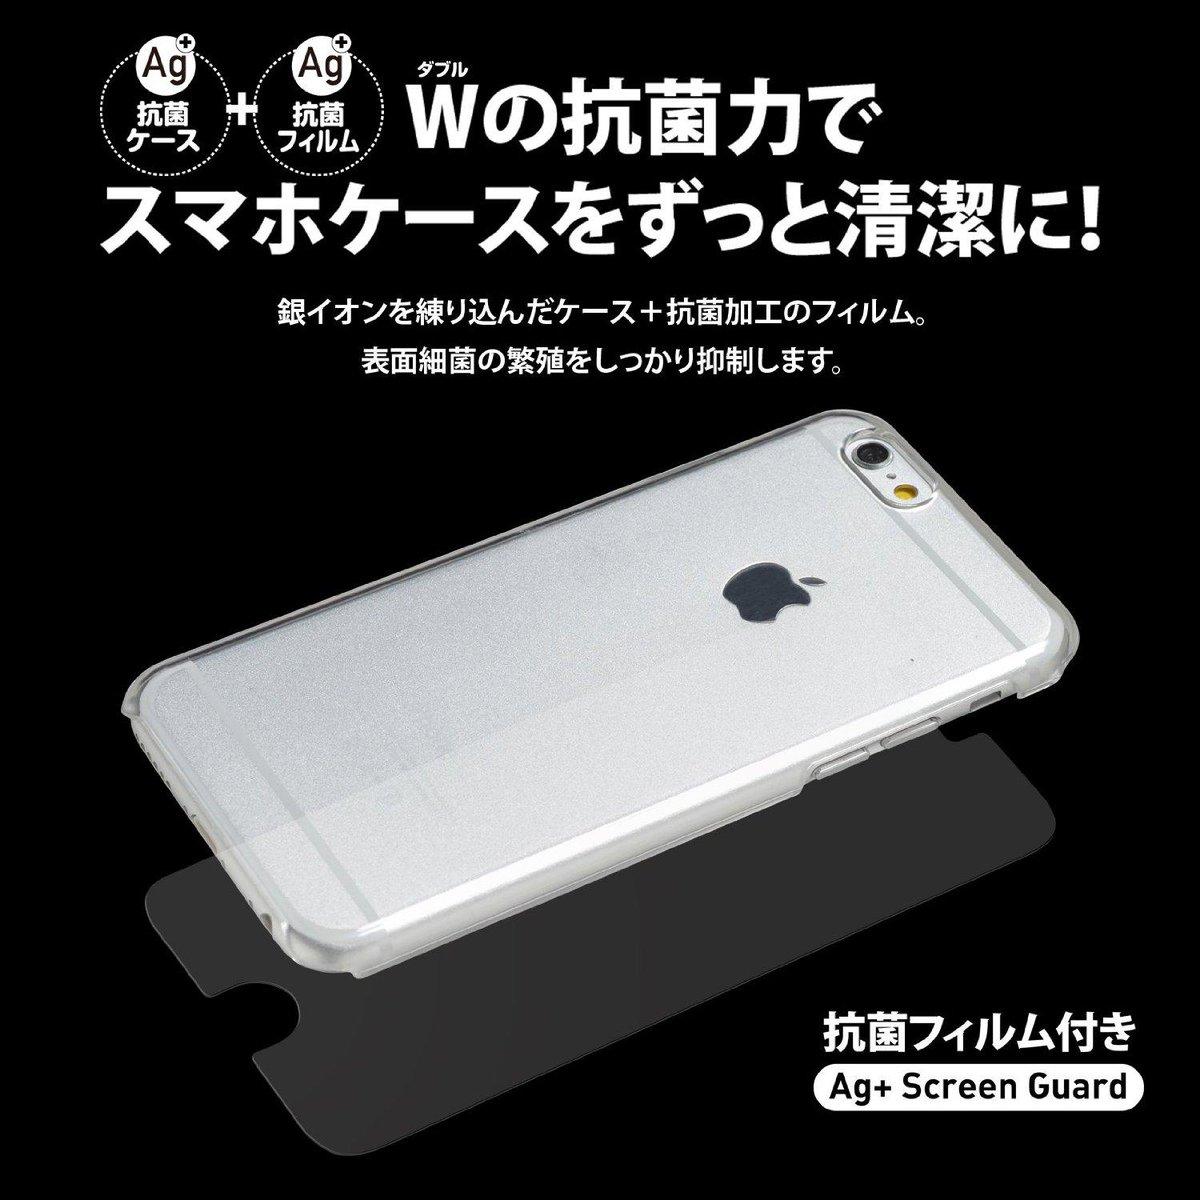 iPhone6の表も裏も抗菌効果できっちりガード! 【ケース】ハードなポリカーボネートに銀イオン系抗菌剤を練り込み 【フィルム】指紋の付きにくいアンチグレアに銀イオン&フッ素の抗菌加工 http://anndy.jp/agpic.twitter.com/Td29VGq34d